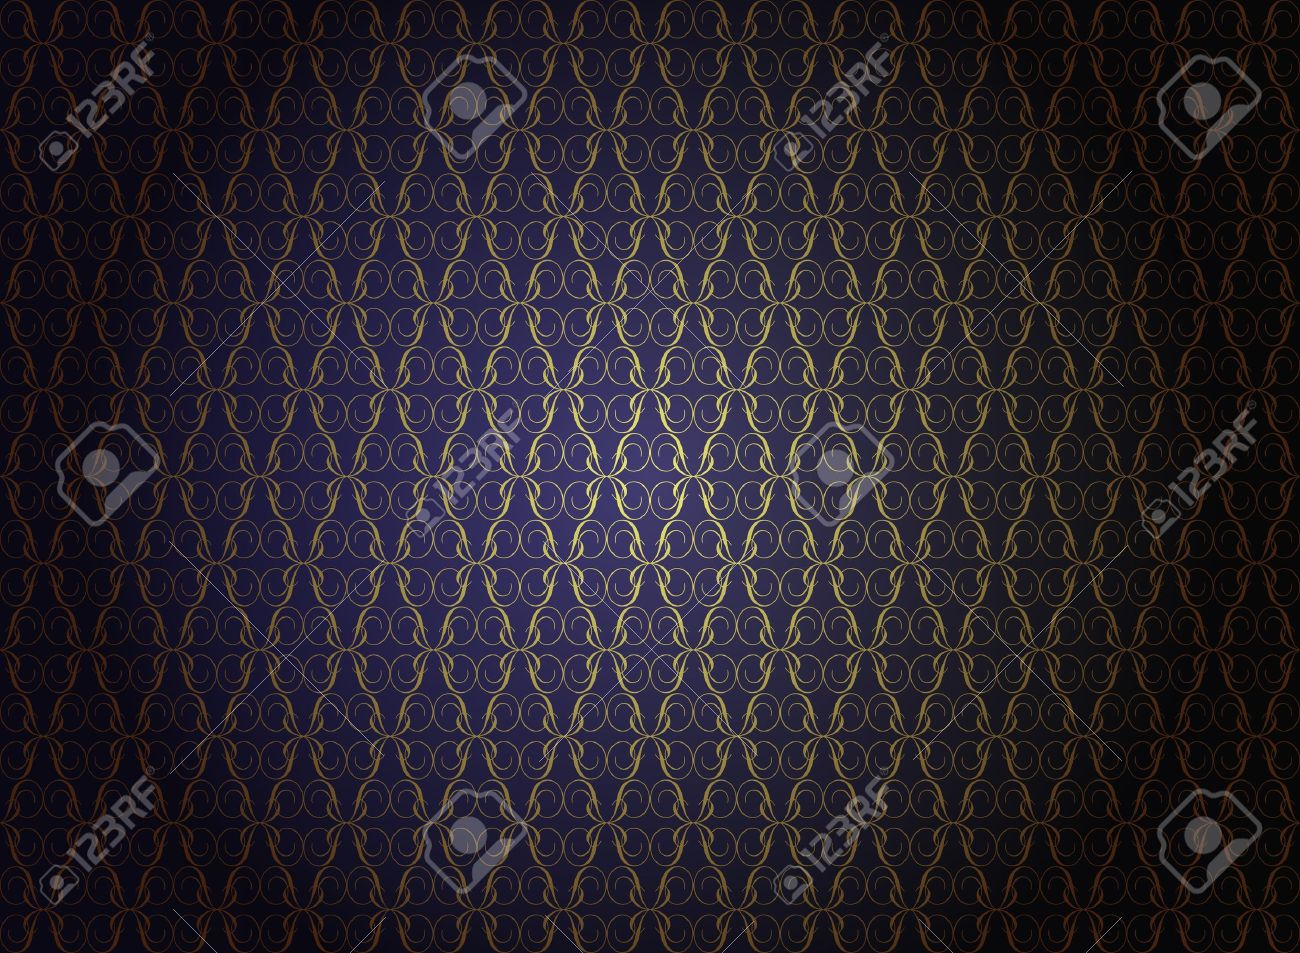 Vintage Wallpaper - Golden Ornaments on Dark Blue Background Stock Vector - 9904124